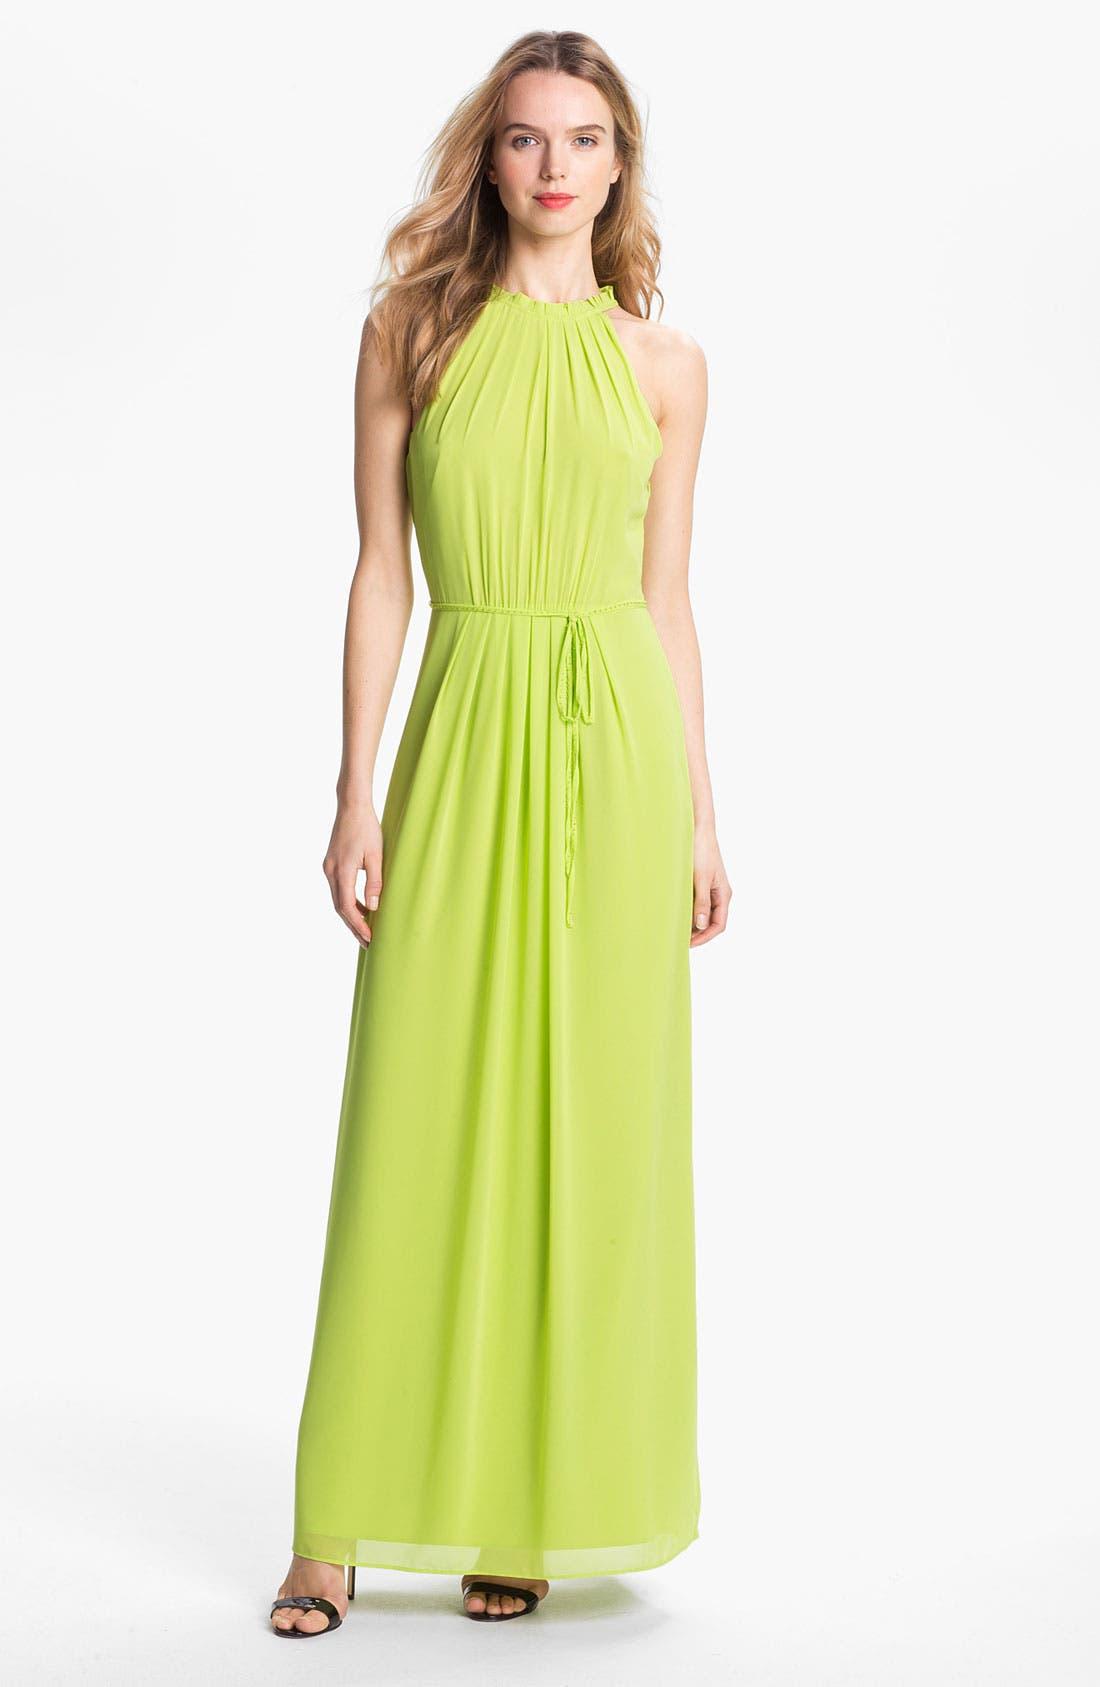 Alternate Image 1 Selected - Ted Baker London Halter Maxi Dress (Online Only)